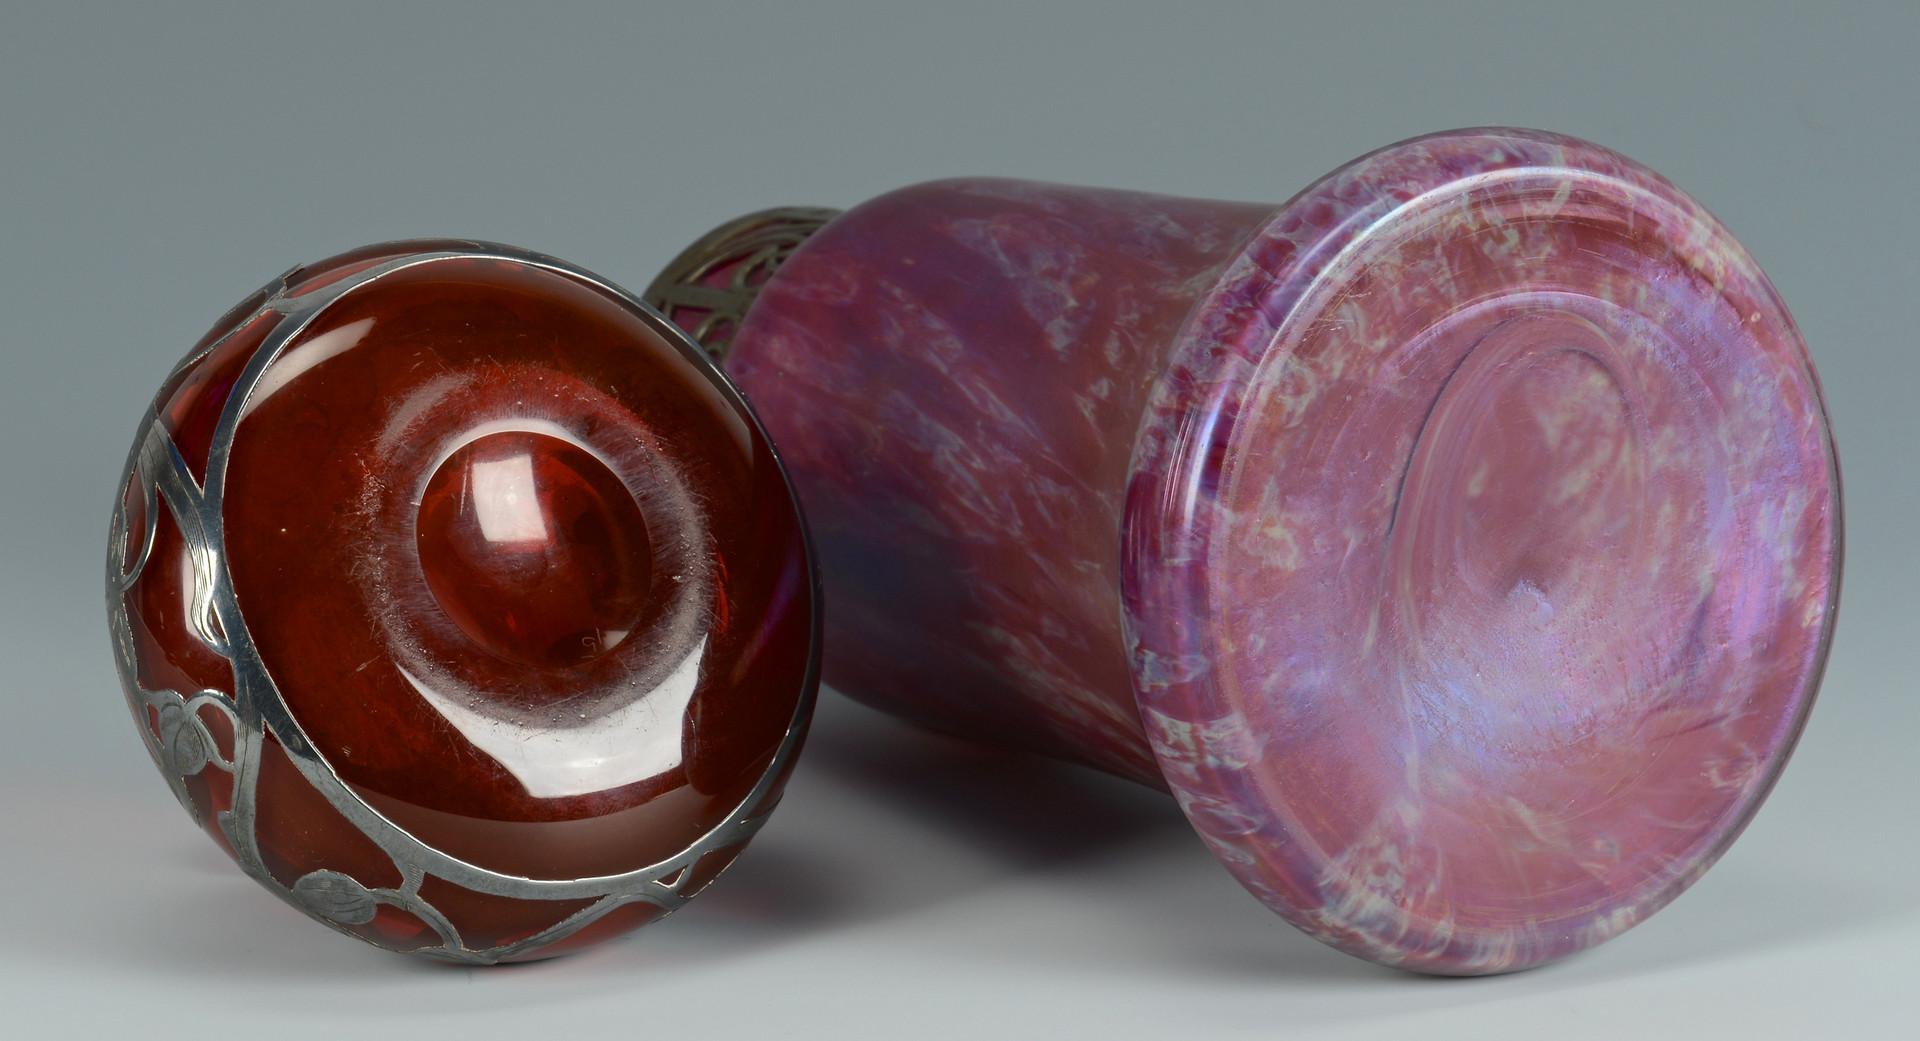 Lot 165: Silver Overlay Vase & Loetz Vase